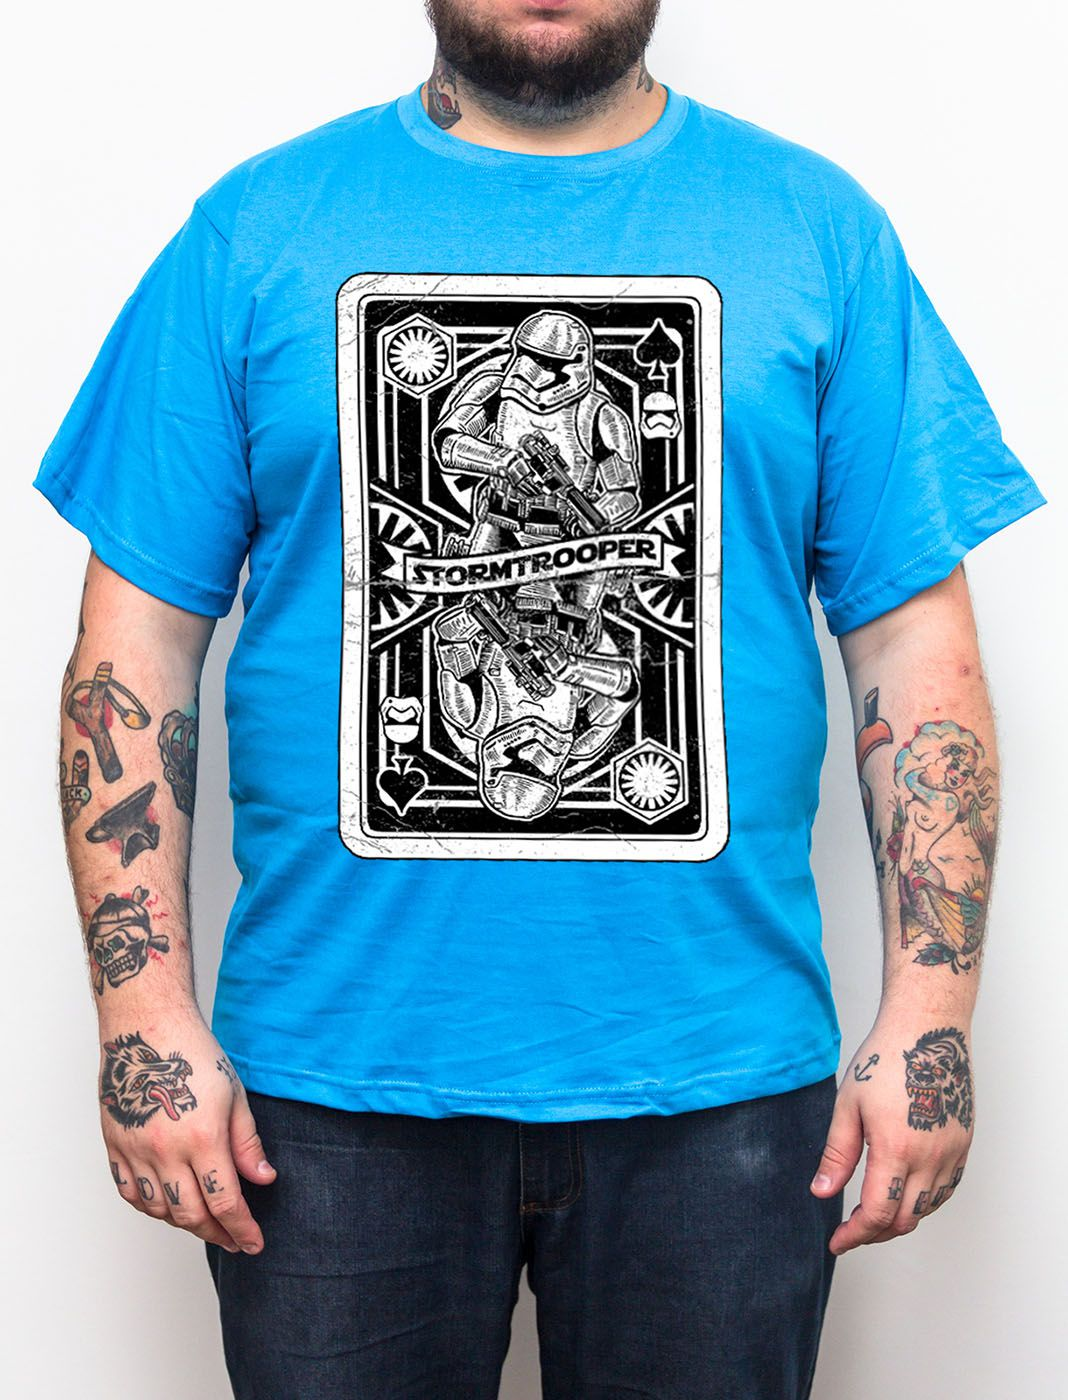 Camiseta Stormtrooper - Plus Size - Tamanho XG  - HShop